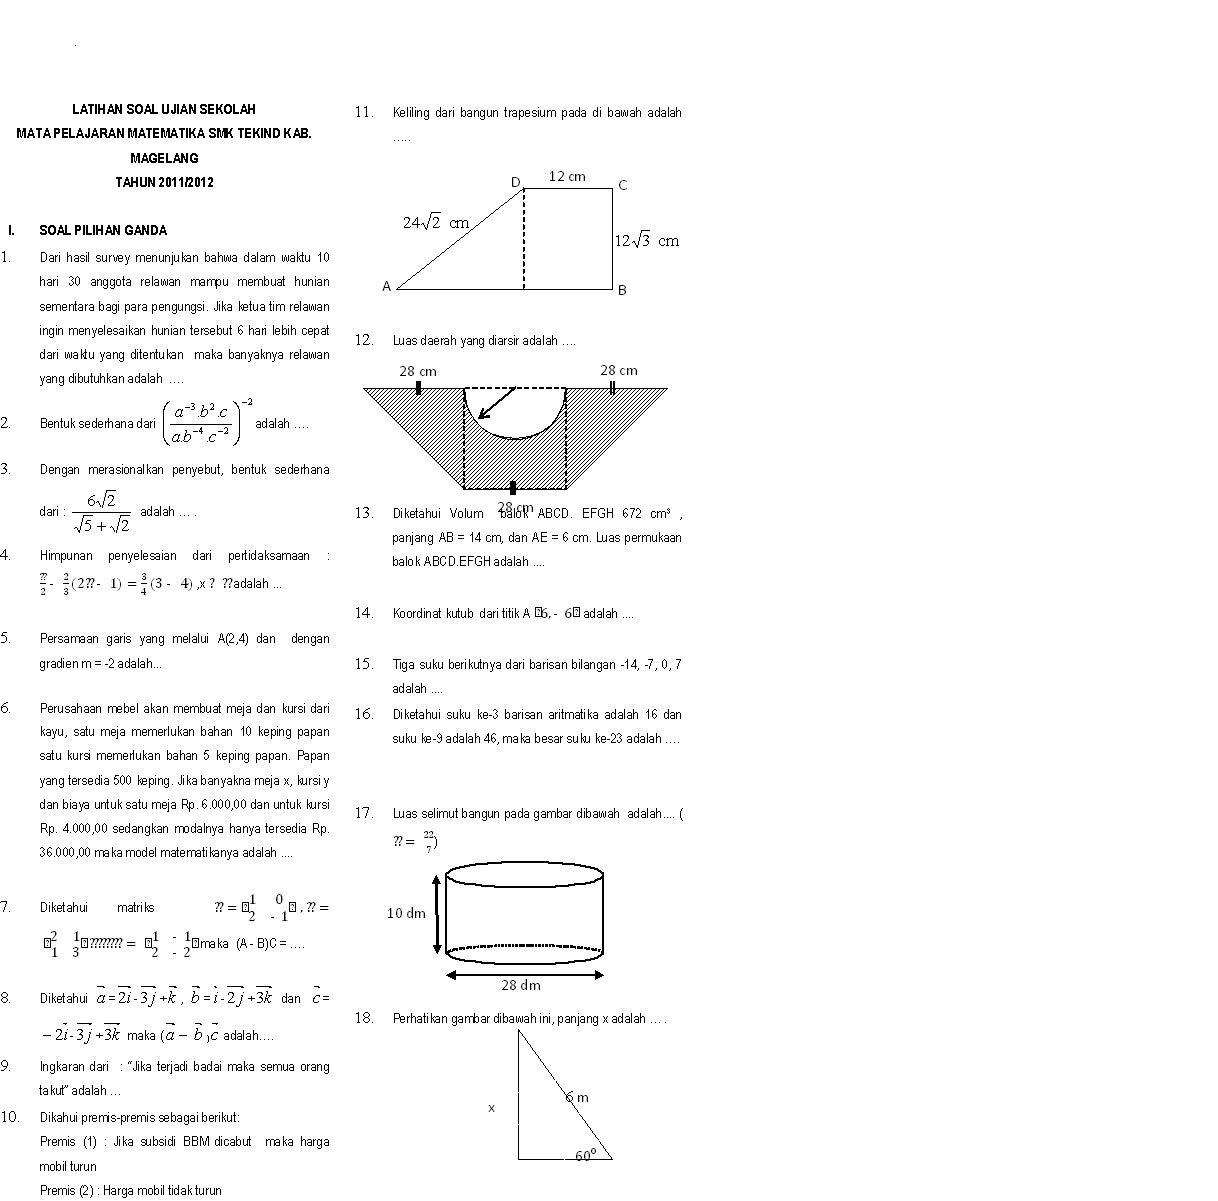 Skanisa Math Maret 2012